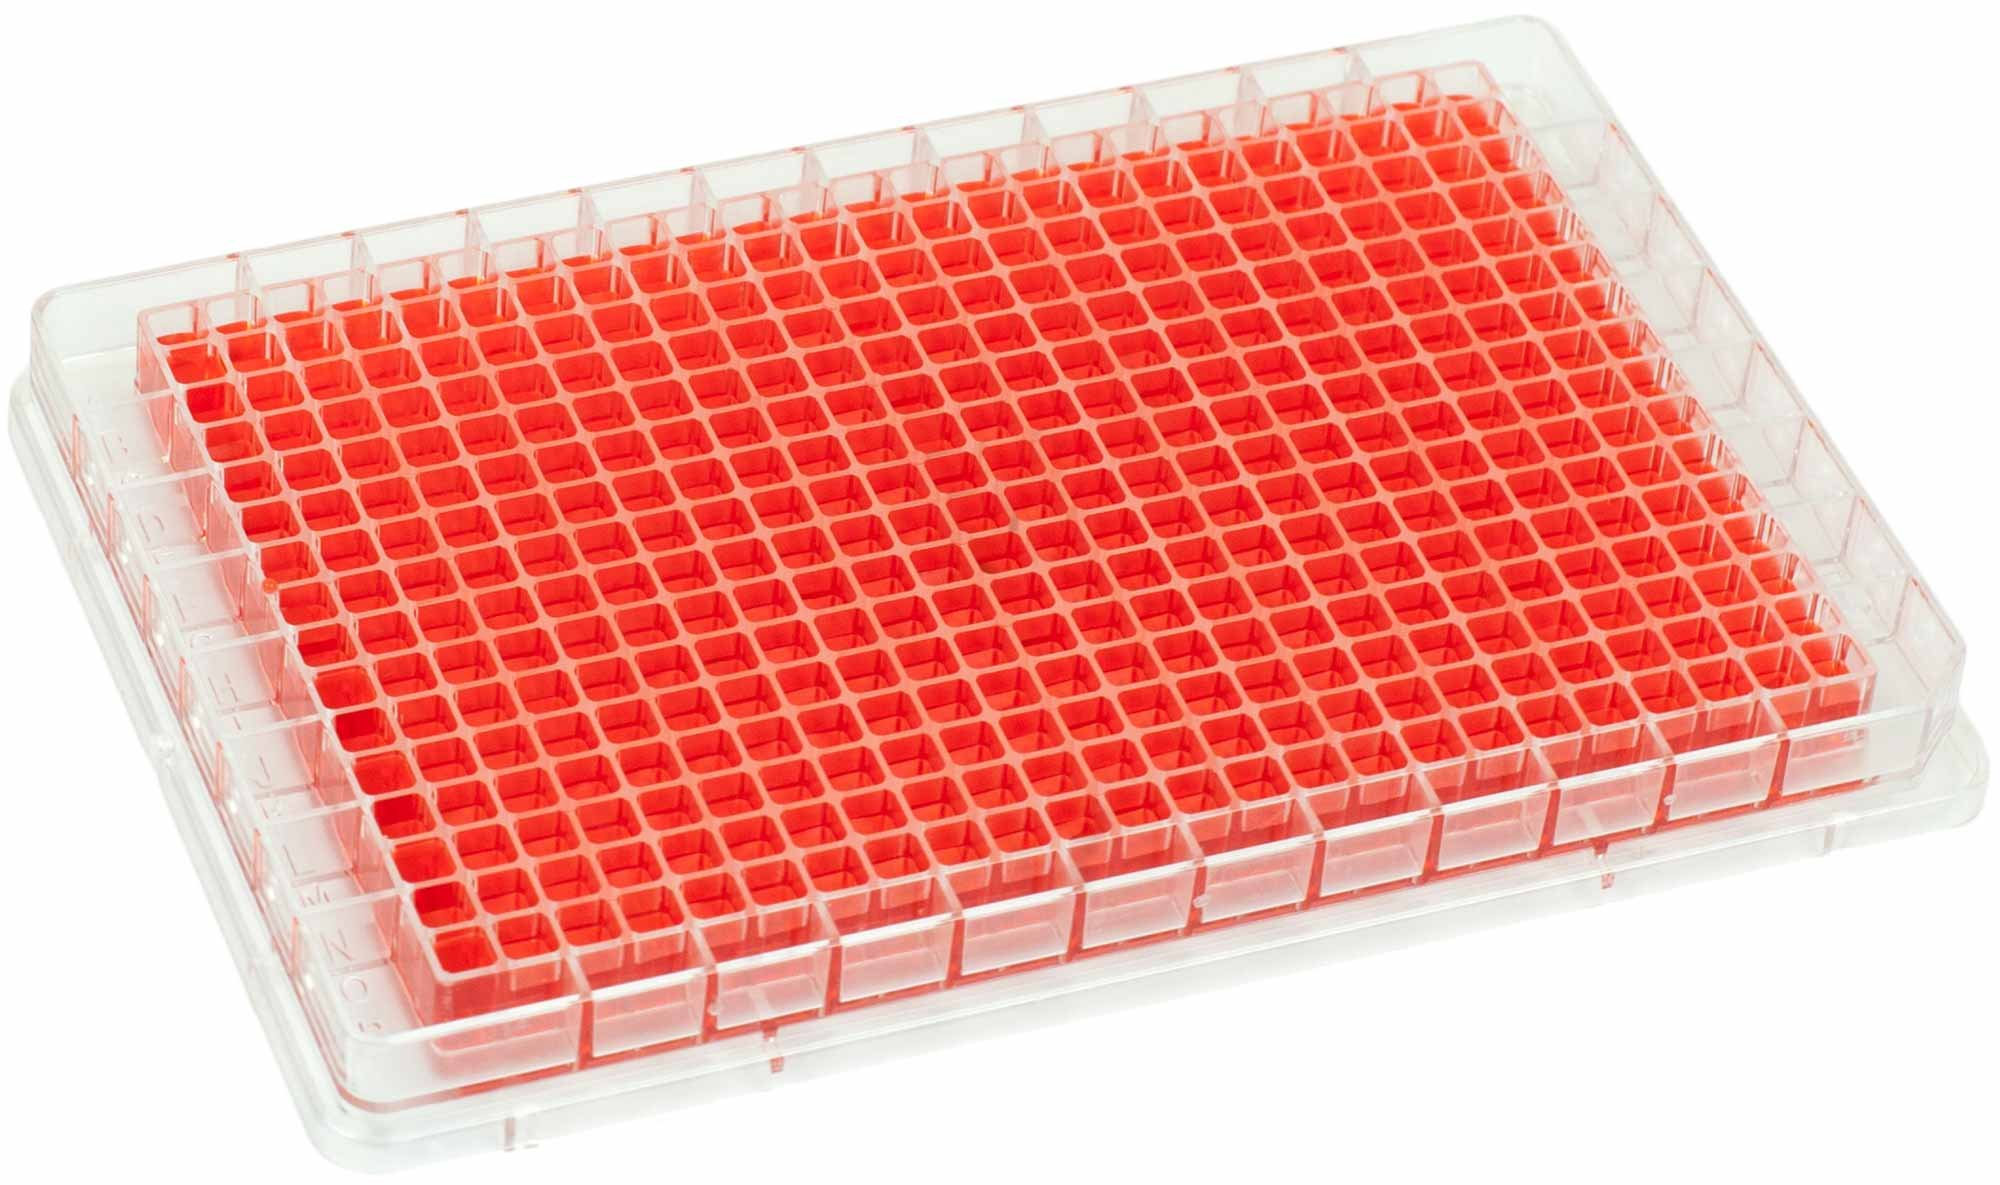 BRANDplates immunoGrade Non-Sterile Treated Surface 384-Well Plate - Transparent, F-Bottom